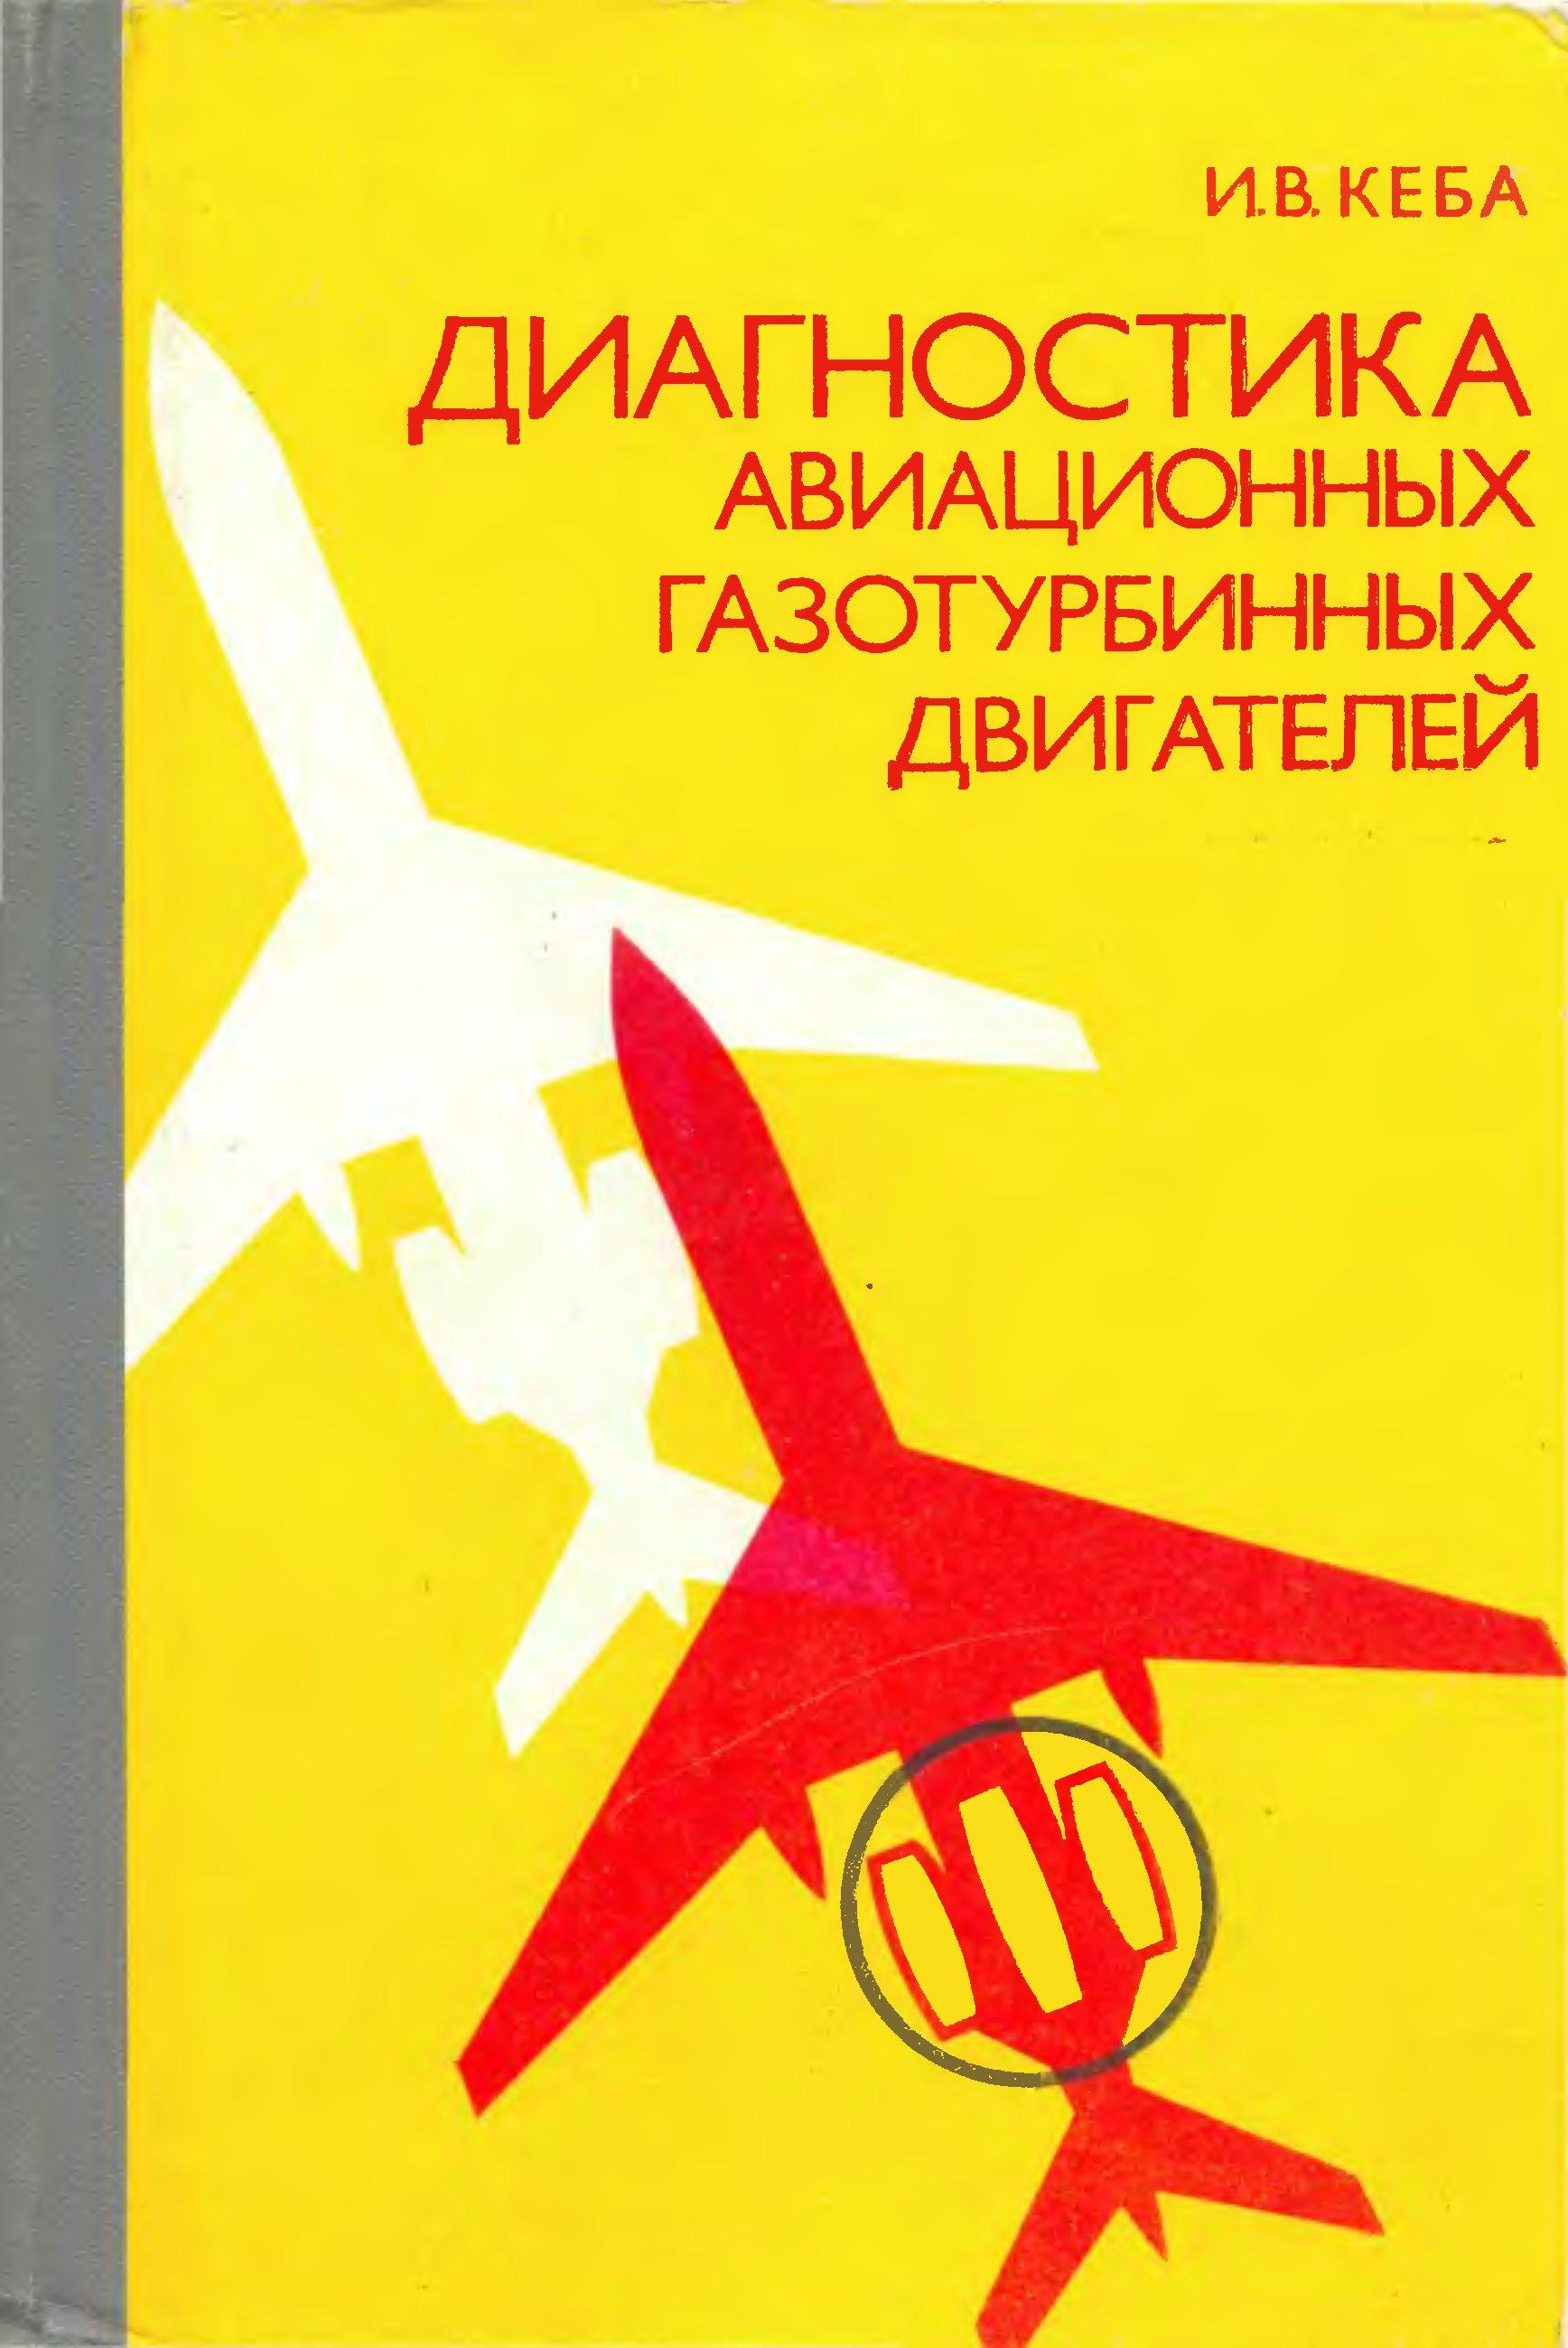 Диагностика авиационных газотурбинных двигателей